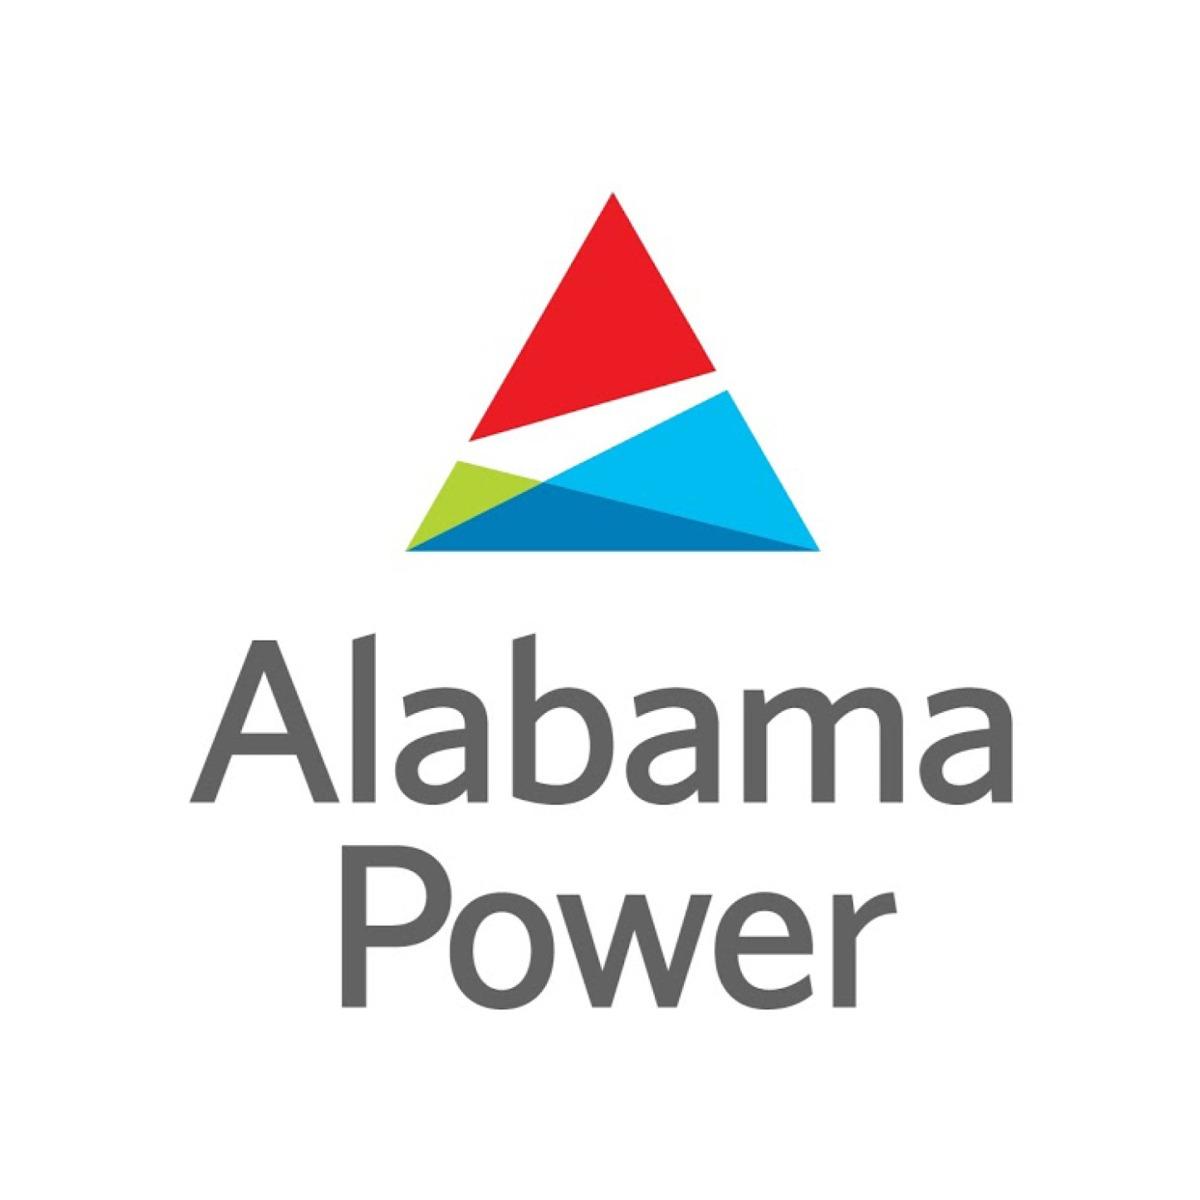 Alabama Power 2